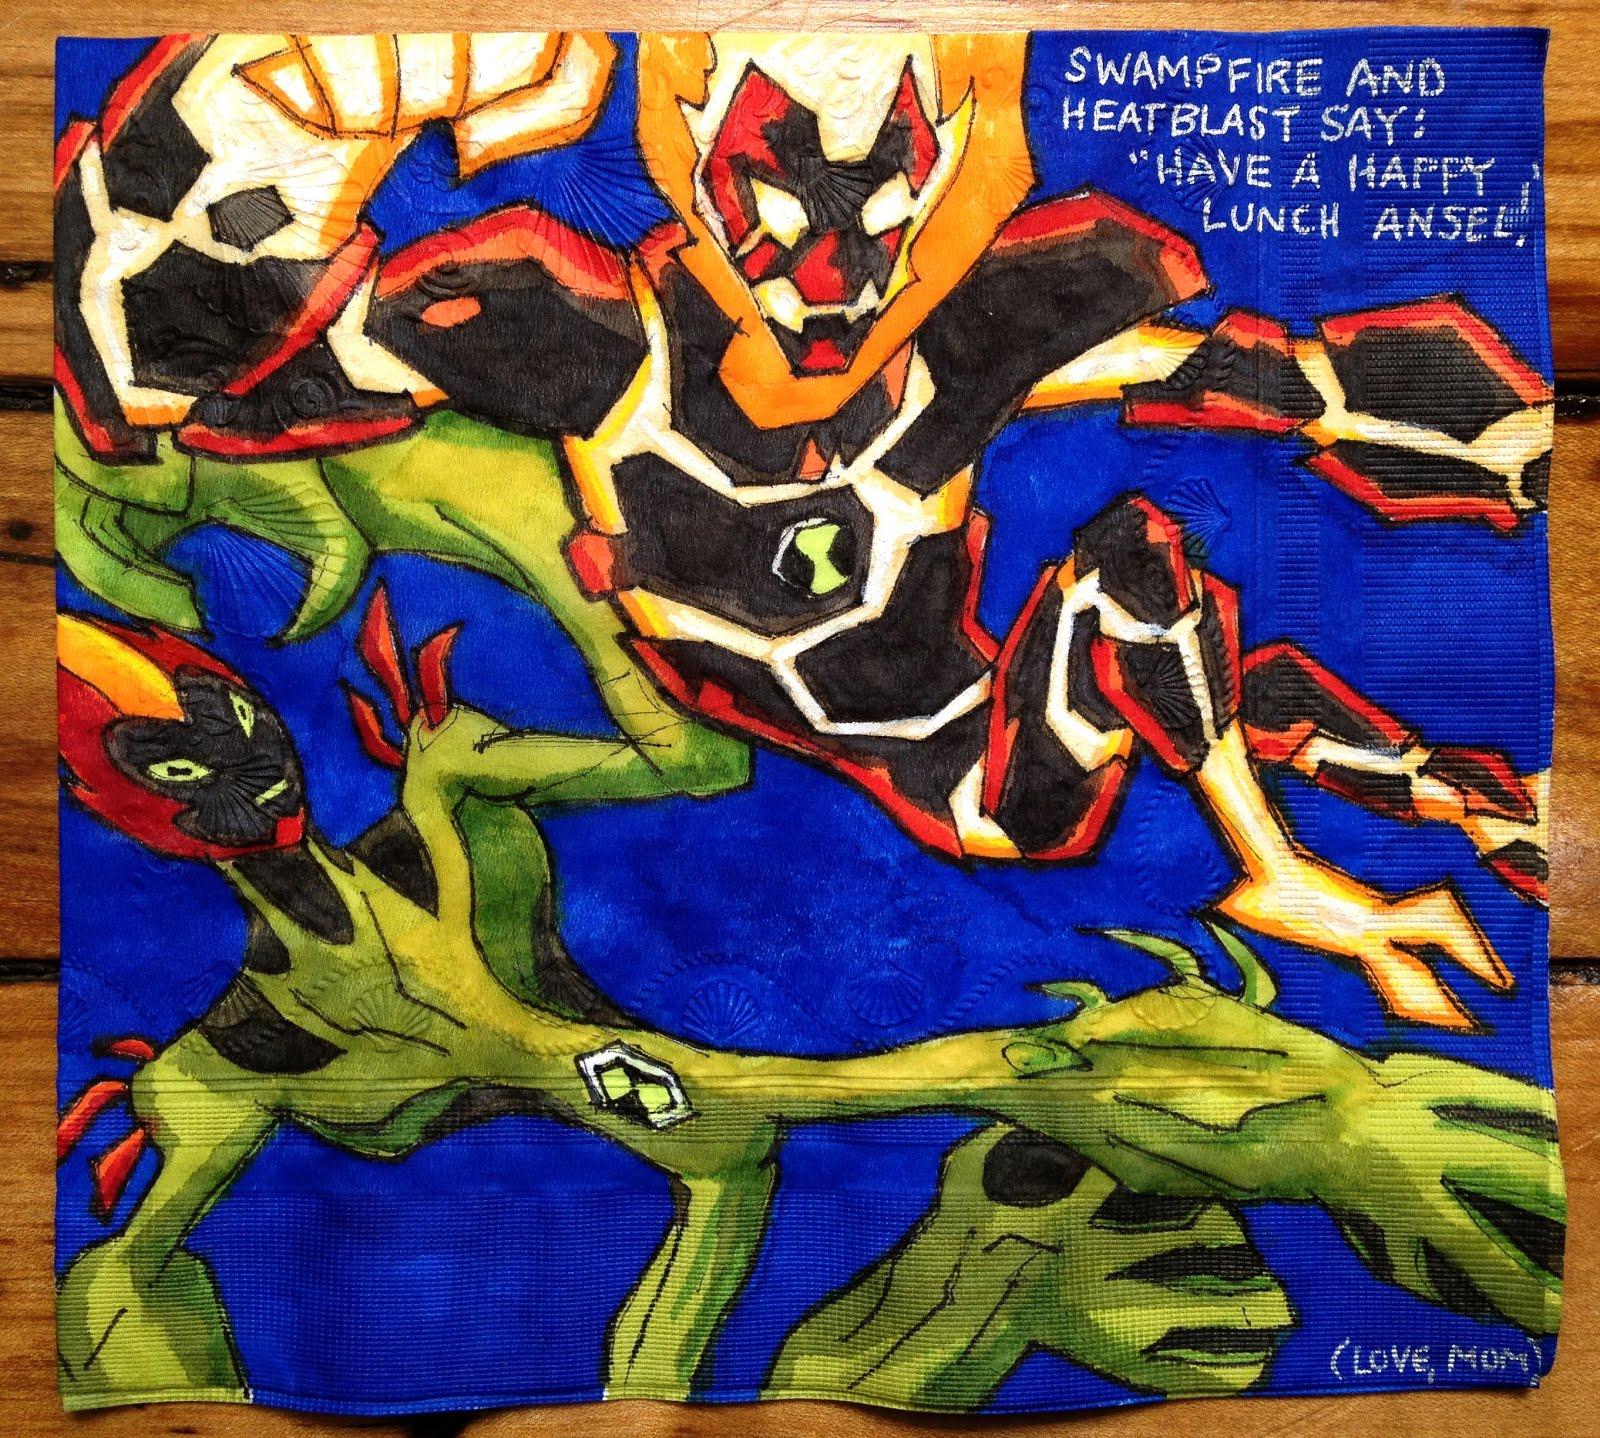 Daily Napkins: Heatblast & Swampfire